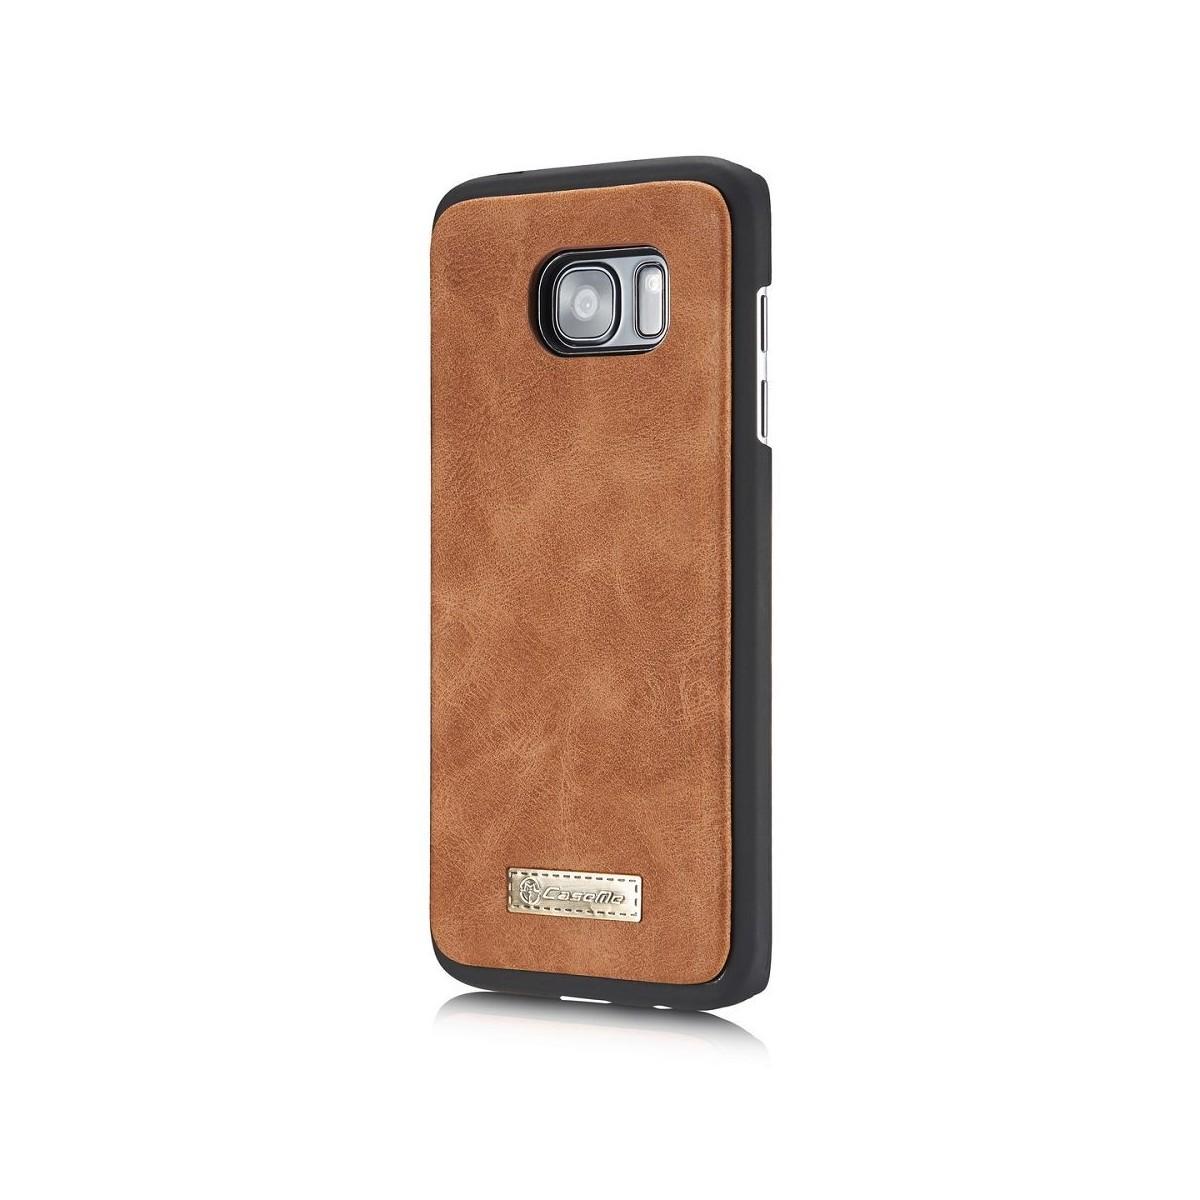 Etui Samsung Galaxy S7 Edge Portefeuille multifonctions Marron - CaseMe